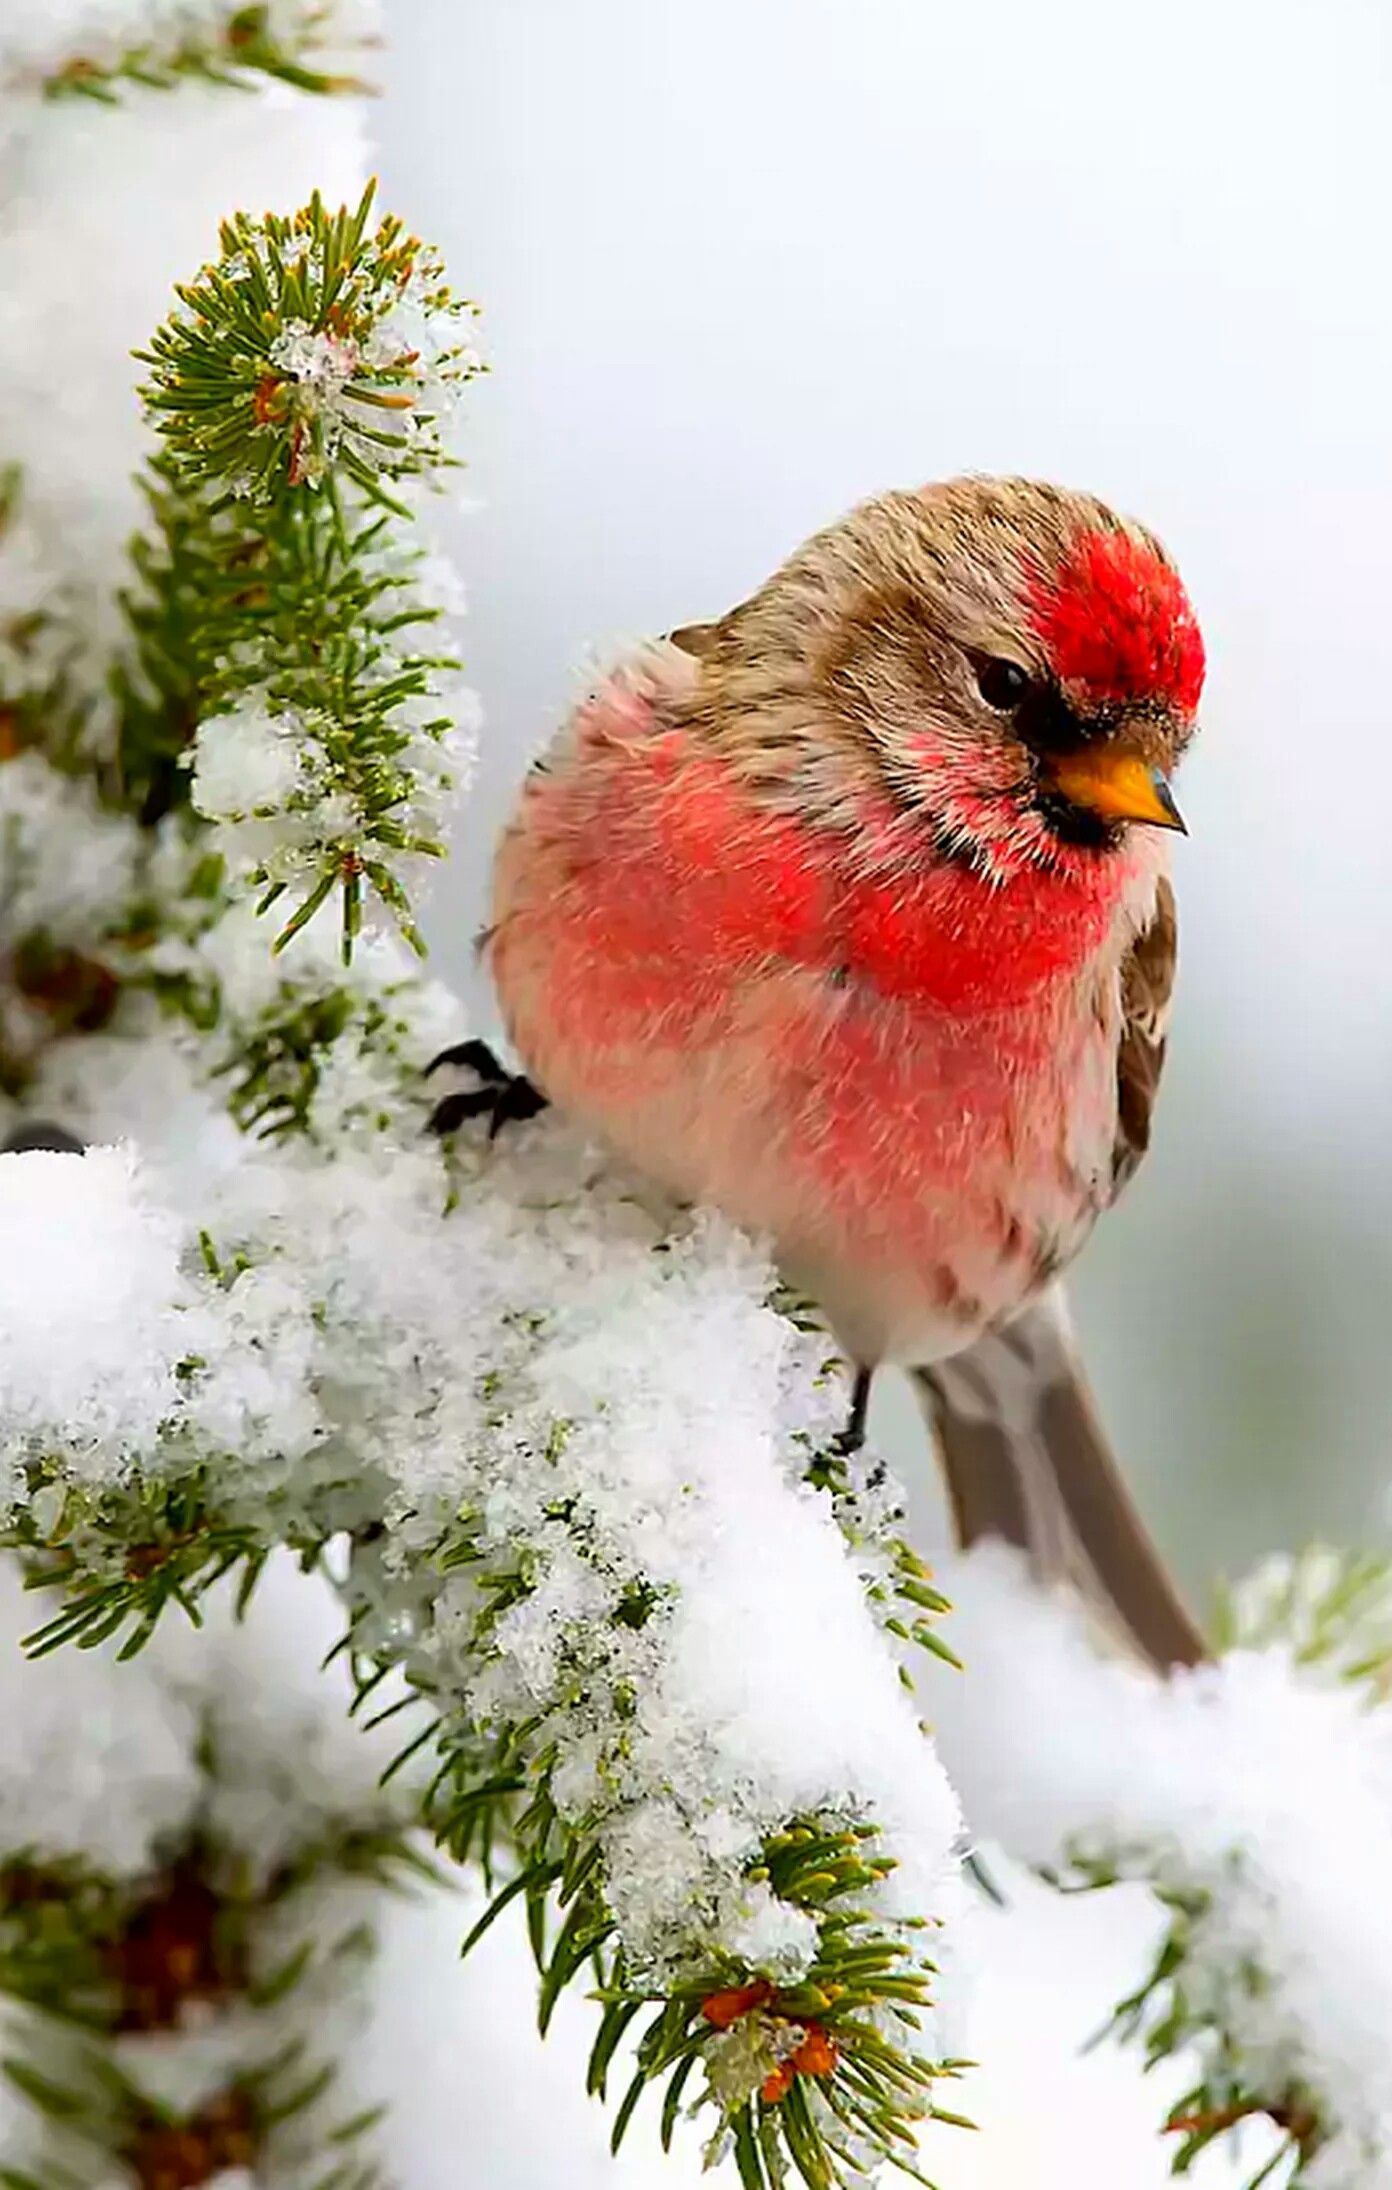 Pin Oleh Doreen Wilson Di Froid Binatang Burung Liar Hewan